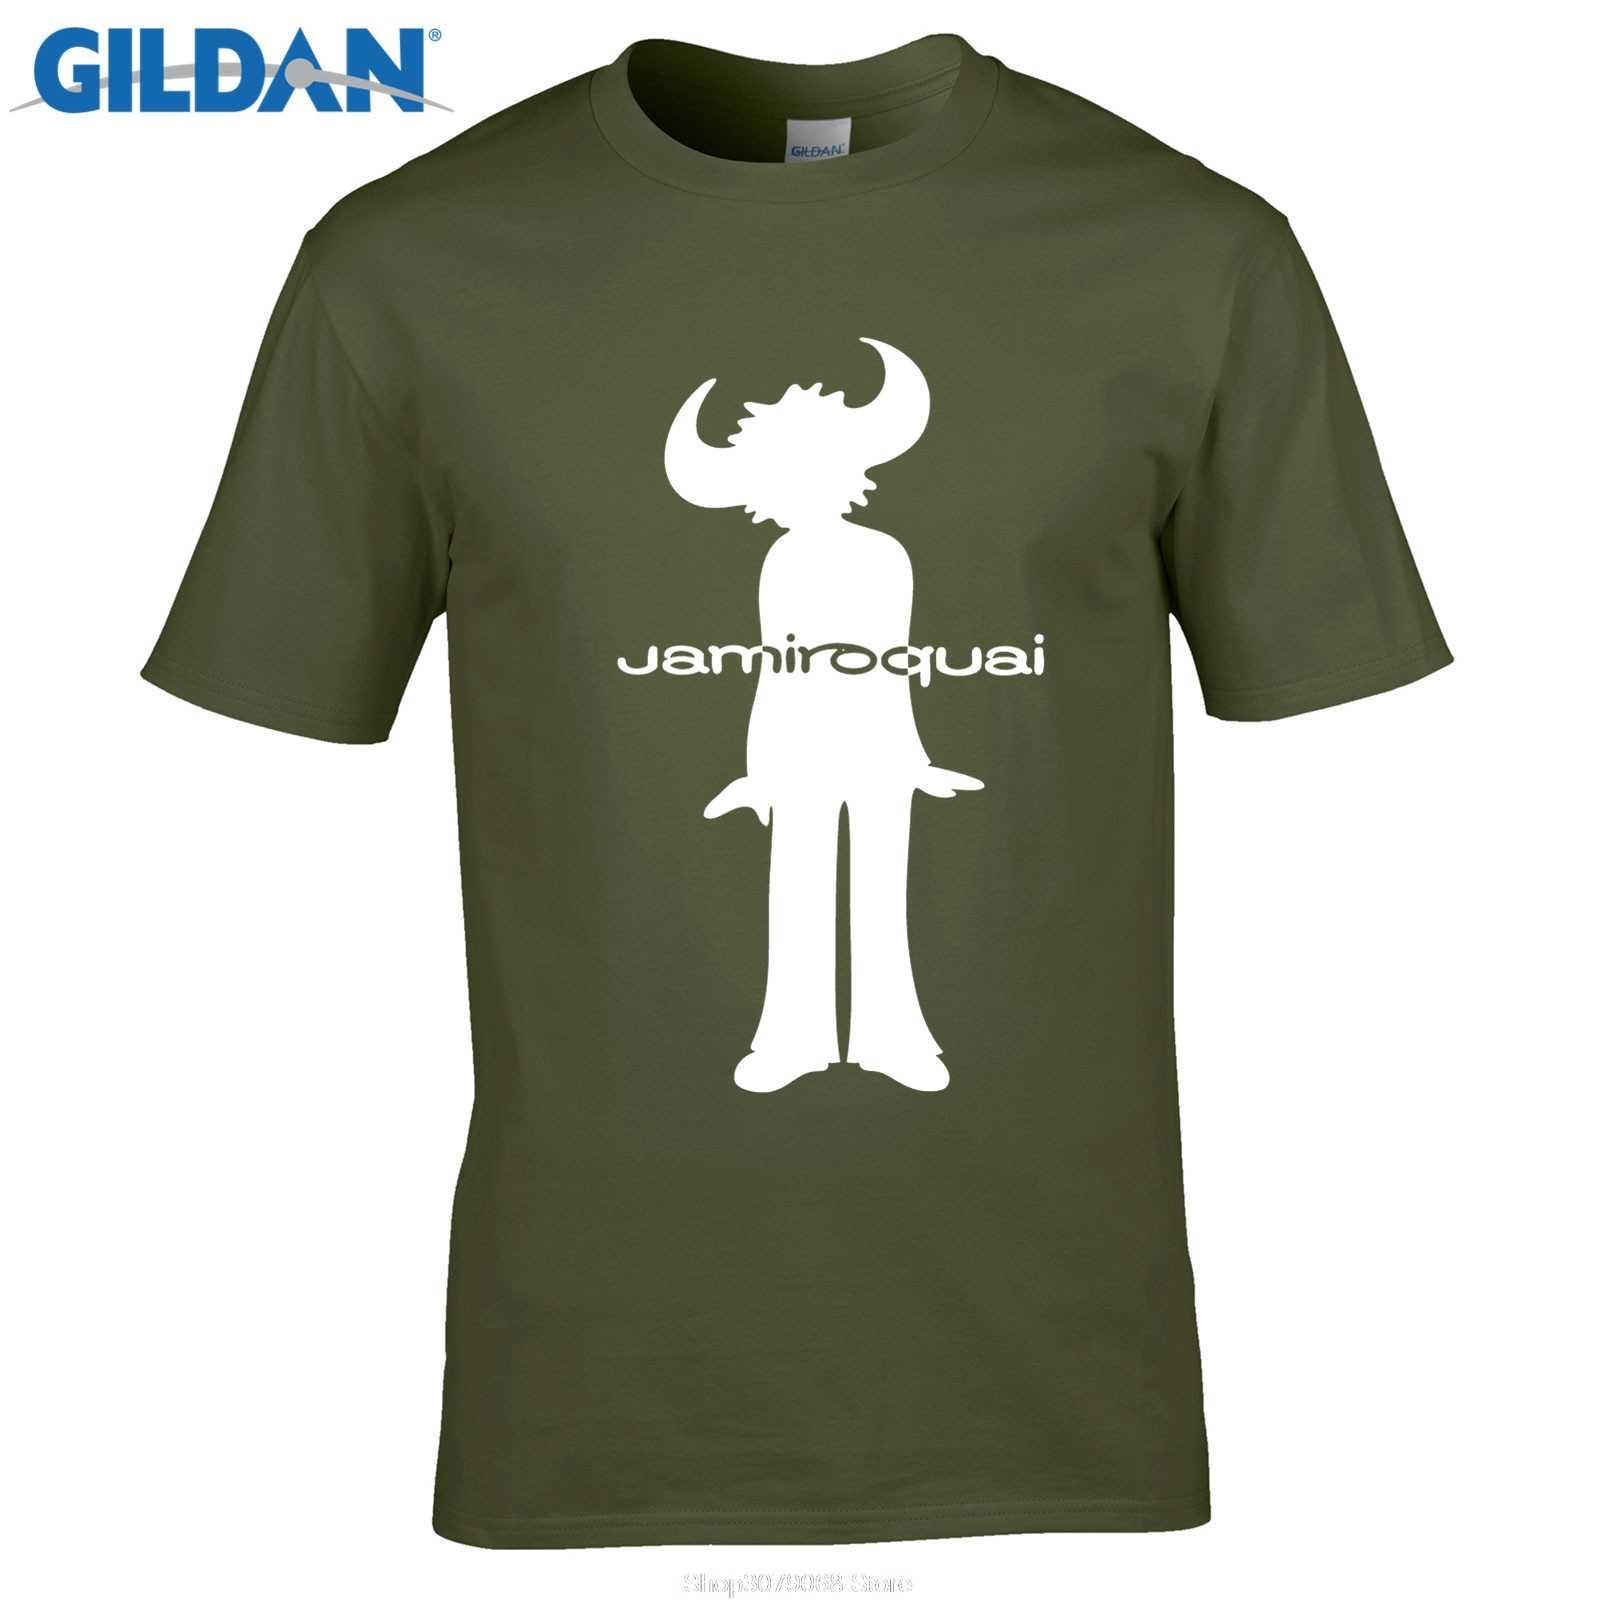 a4cfc9e834ba2 GILDAN Men's O-Neck Short Funny T Shirt Art T-shirt, Maglietta Jamiroquai  Rock Tee Shirt Designer Male Tee Shirt Designer